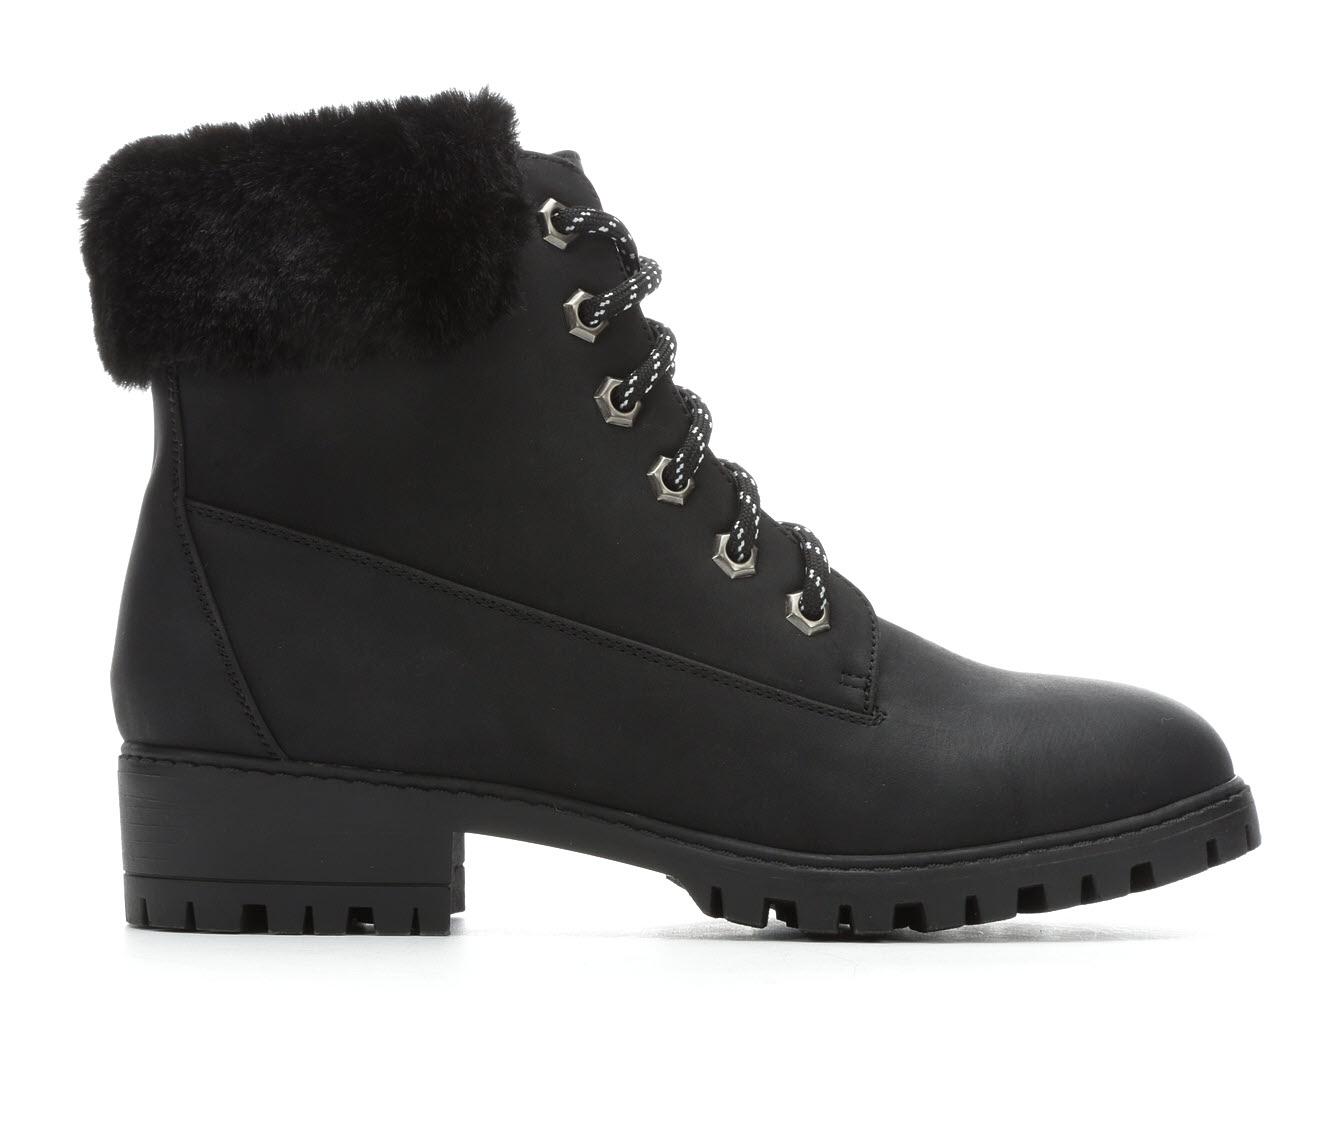 Madden Girl Frannkie Women's Boot (Black Faux Leather)